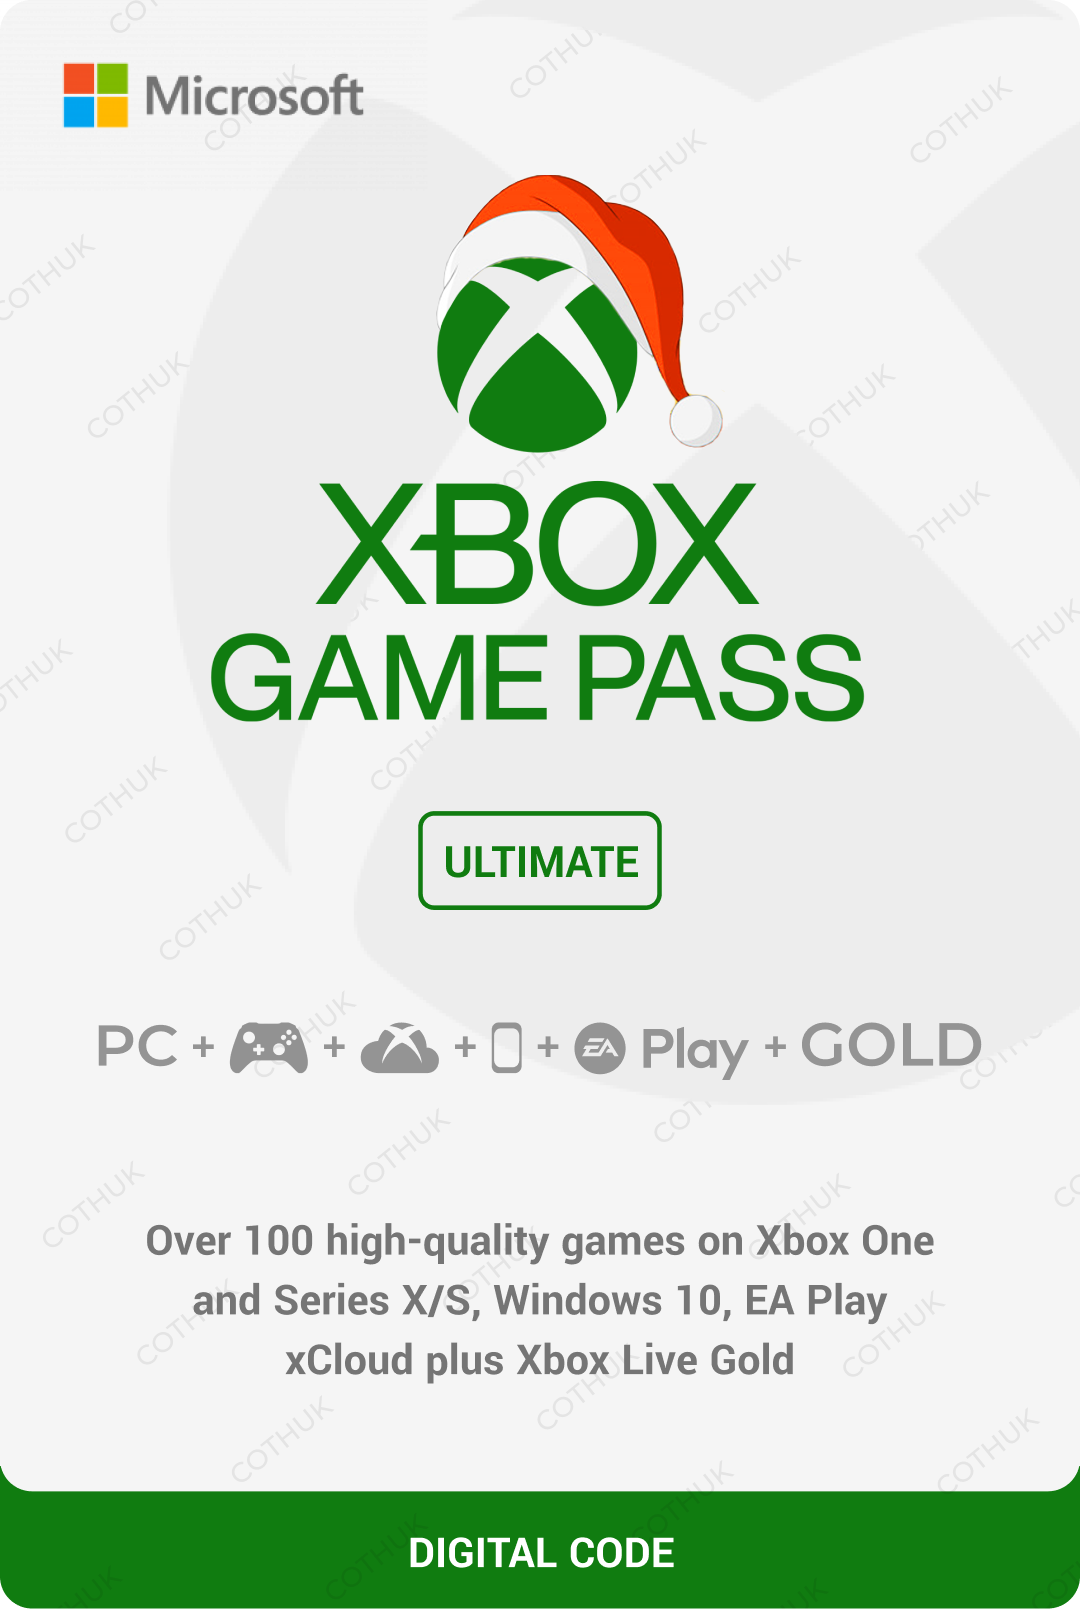 XBOX GAME PASS ULTIMATE на 14 дней+ EA Play + 1 Месяц